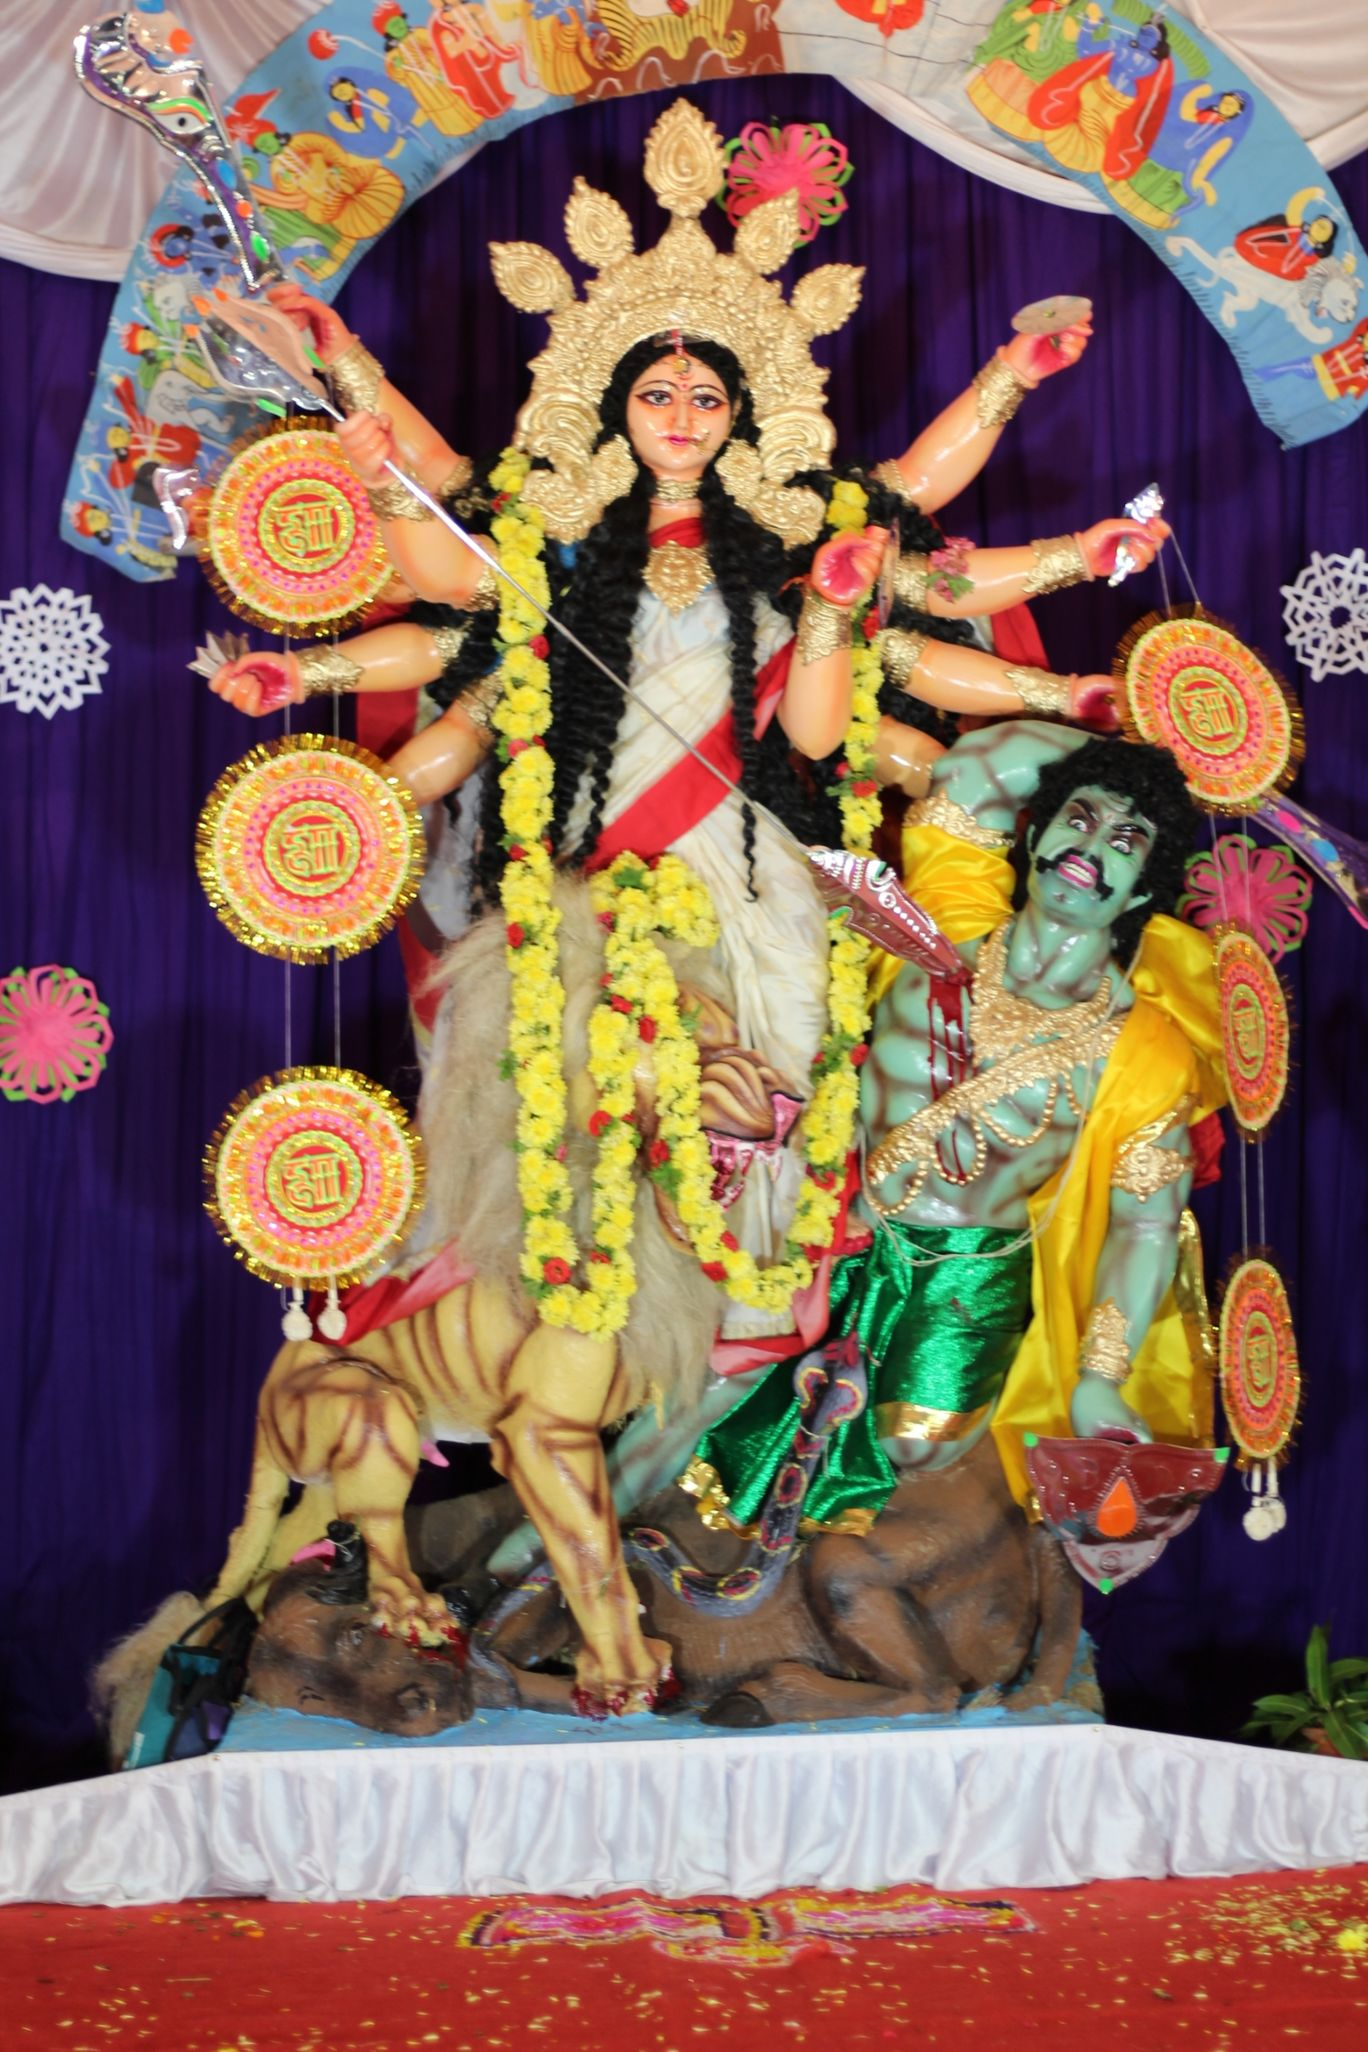 Photo of Durga puja 2018 By Satyajit Das